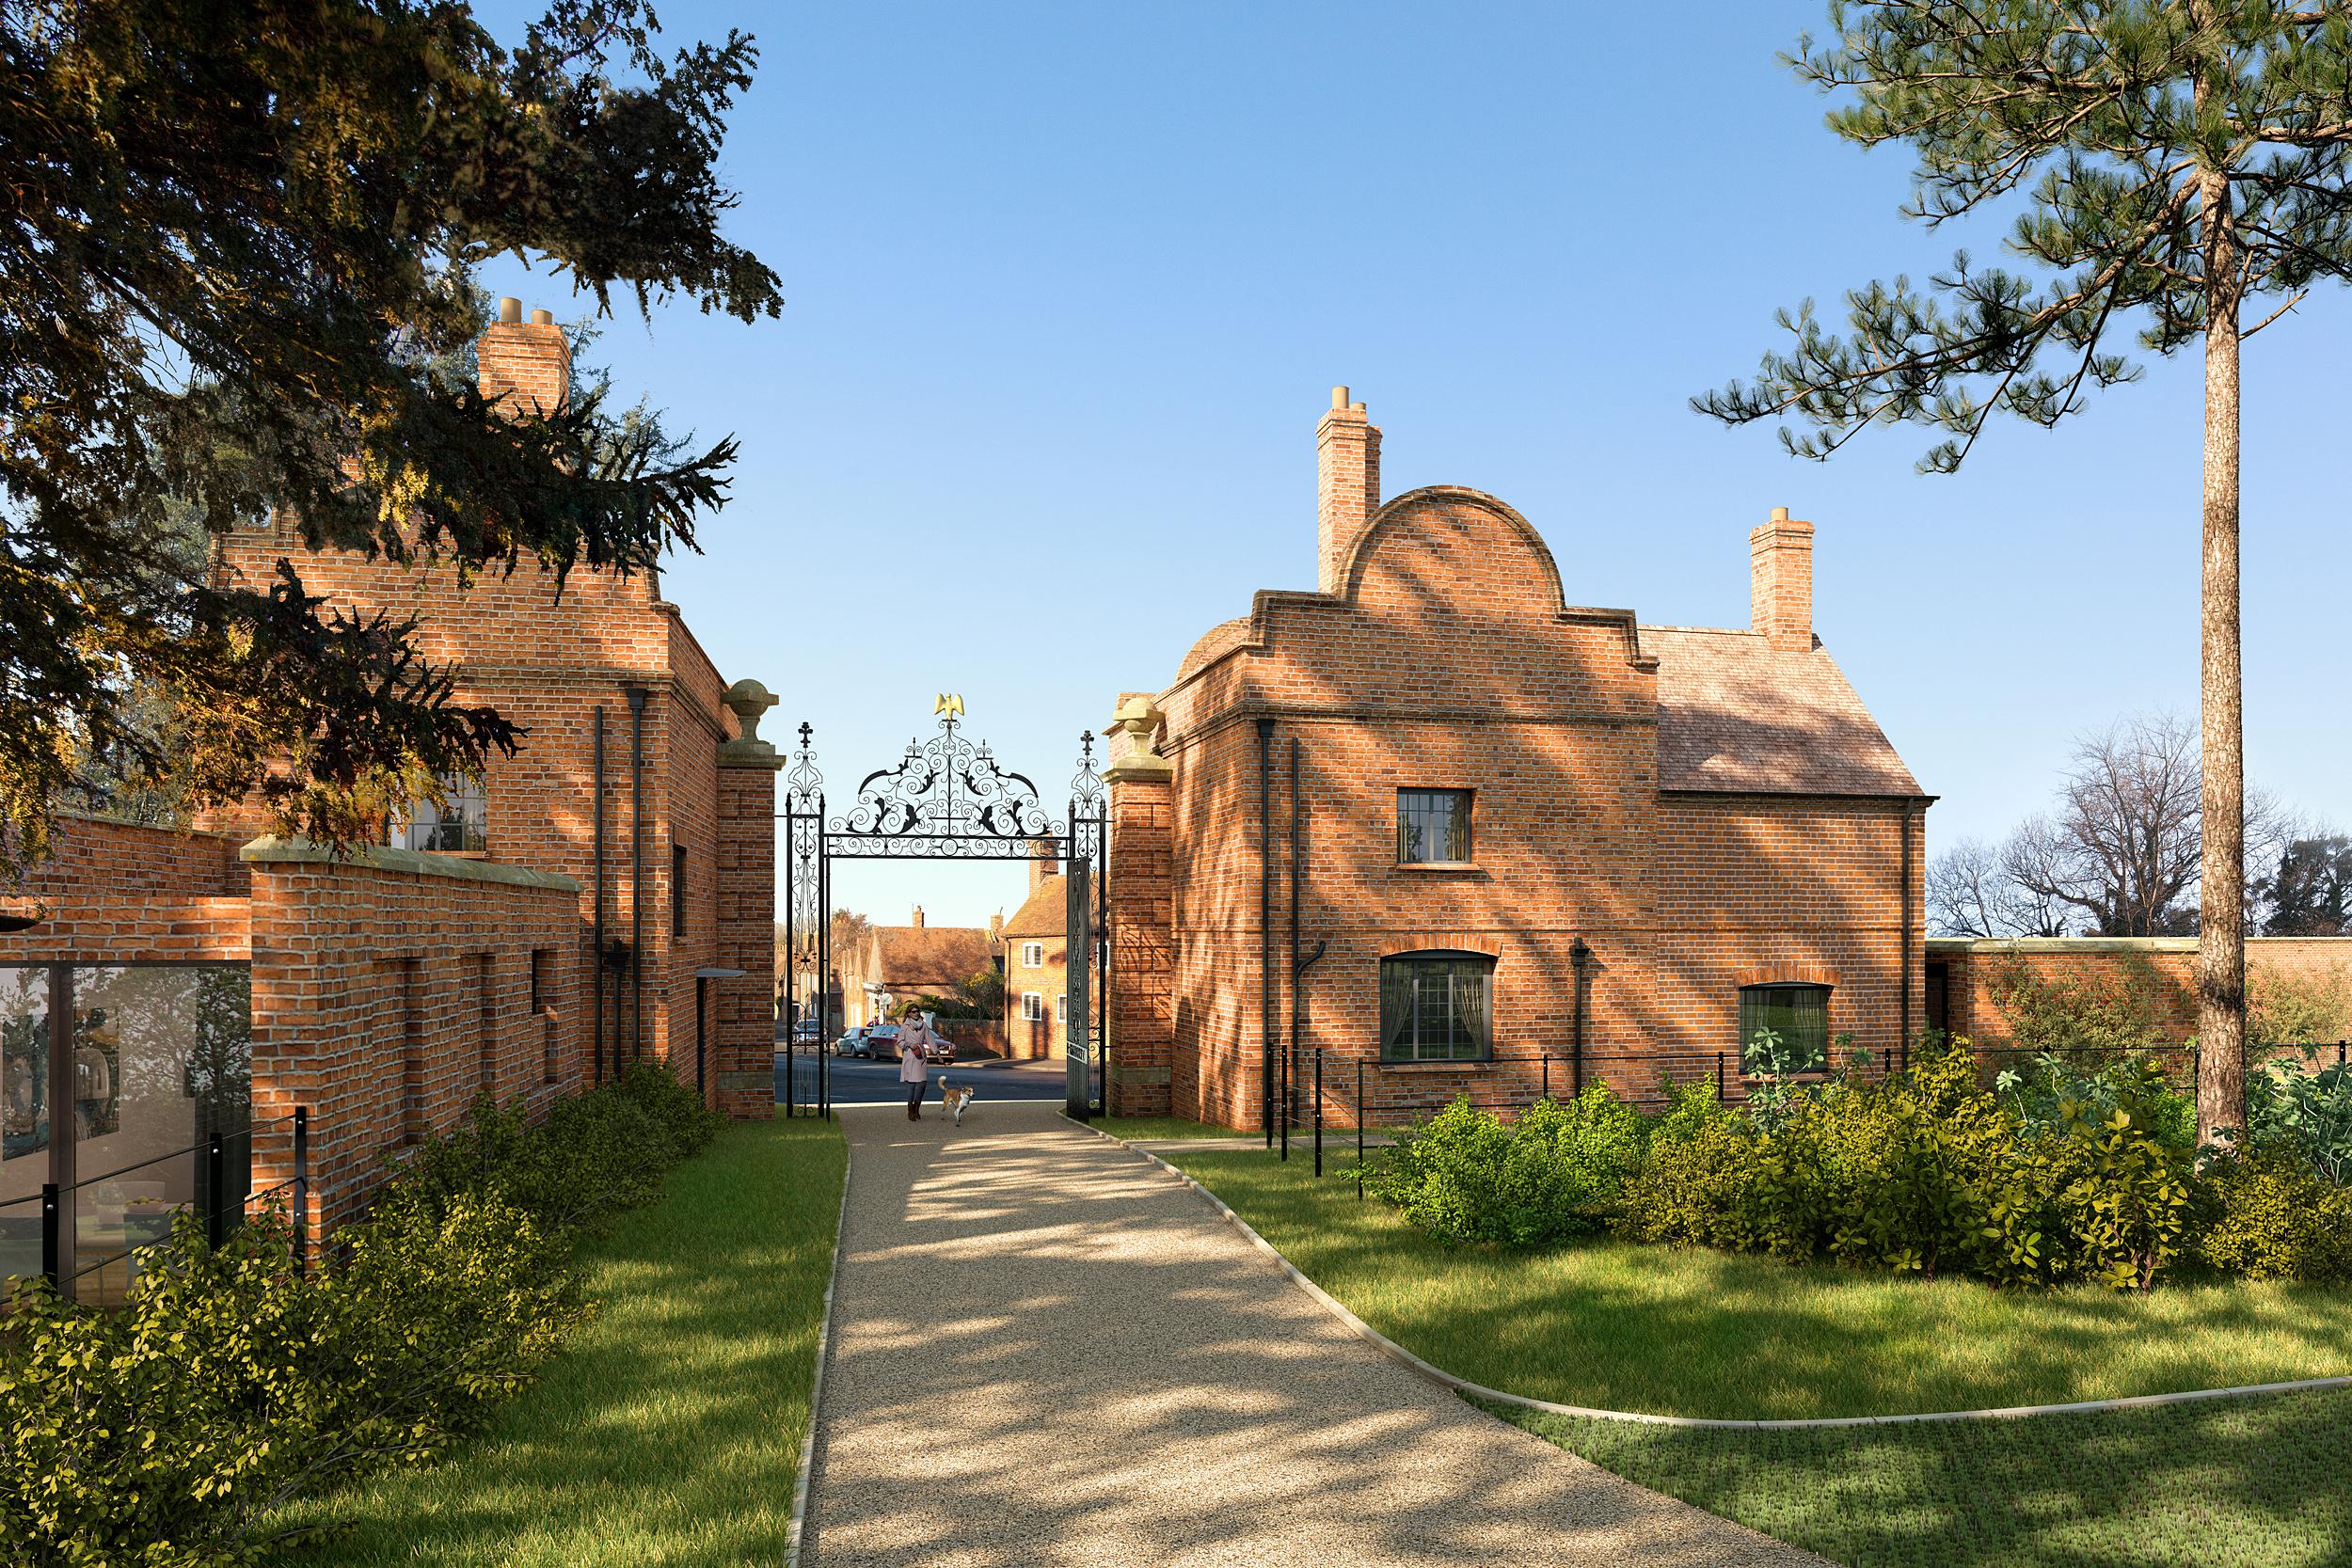 Aldermaston_Gatehouse_Lodge.jpg